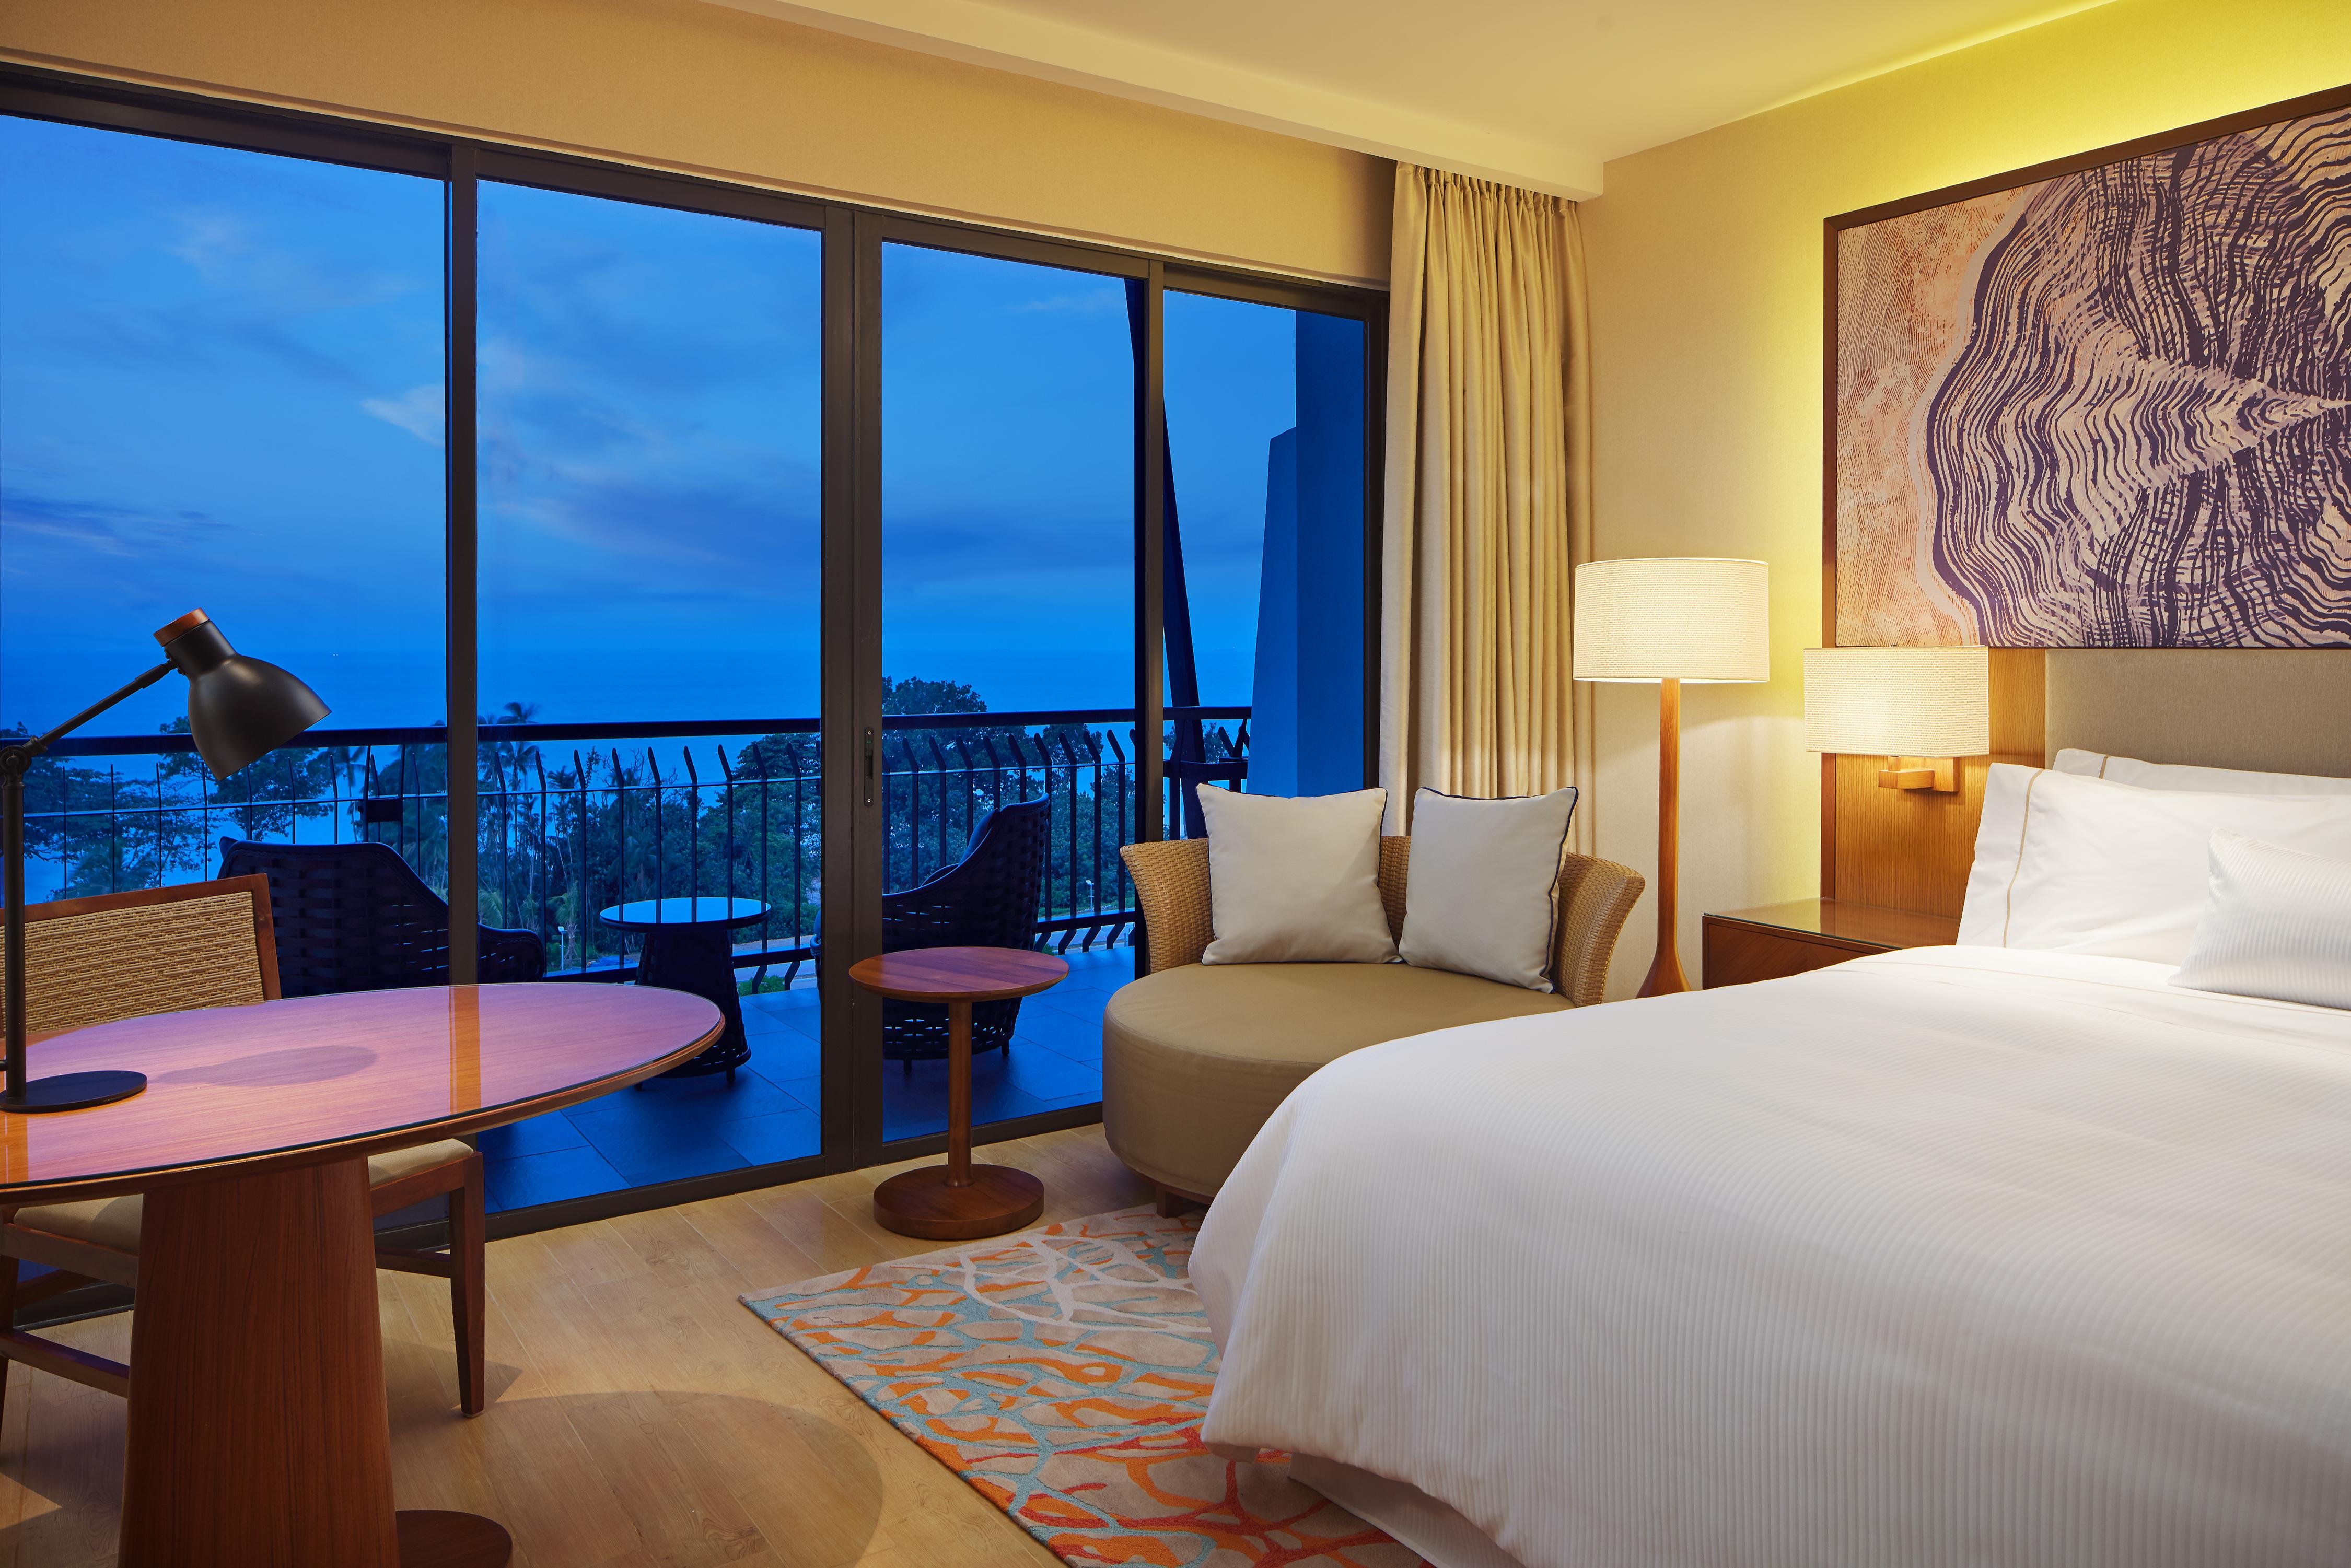 The Westin Desaru Coast Resort, Kota Tinggi